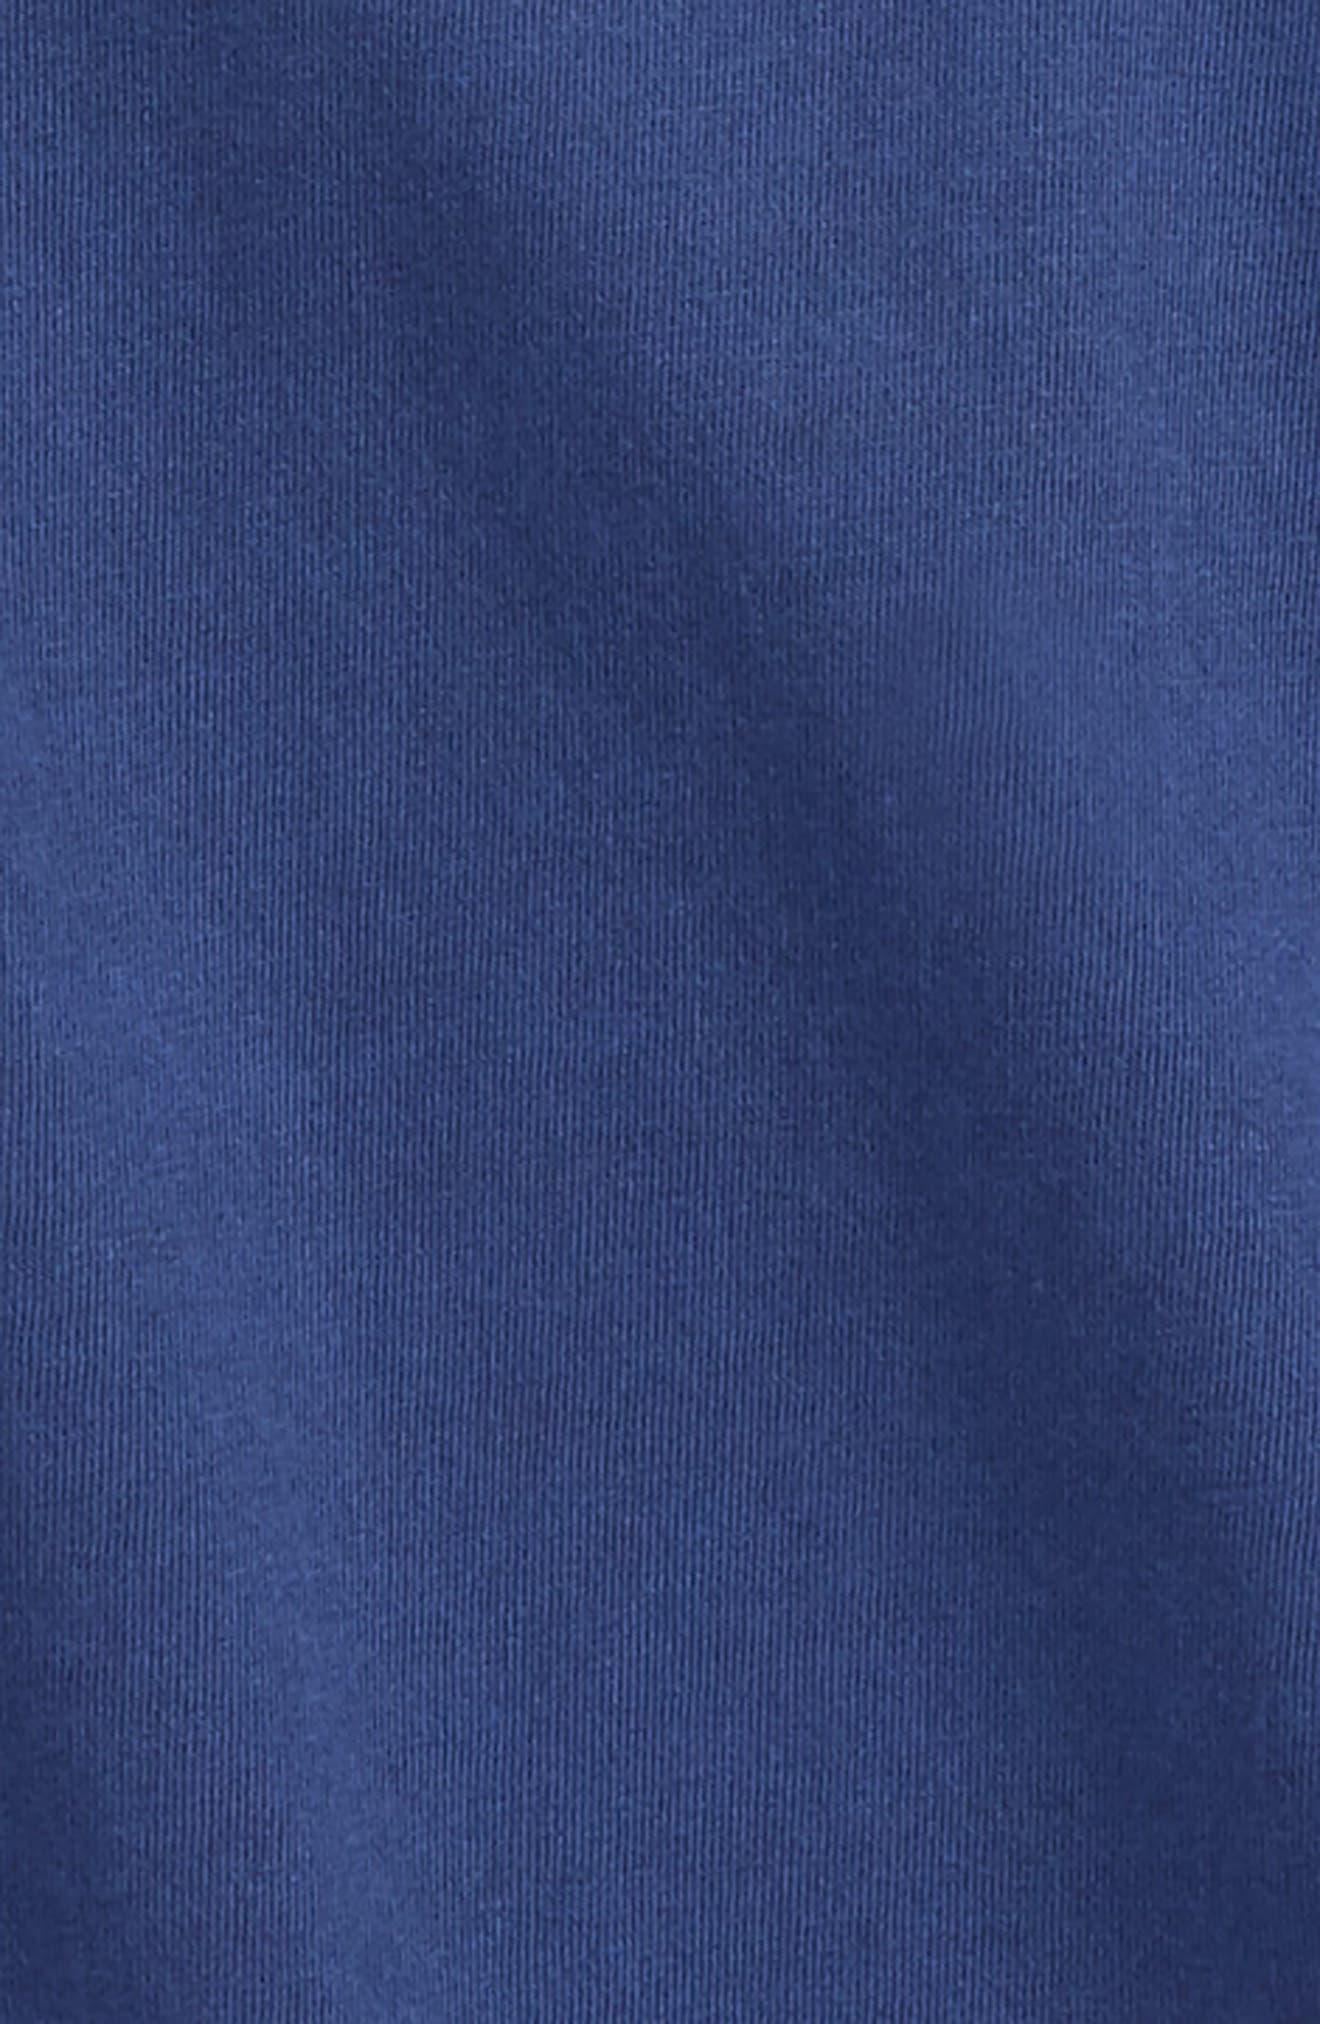 Tie Sleeve Tee,                             Alternate thumbnail 2, color,                             410